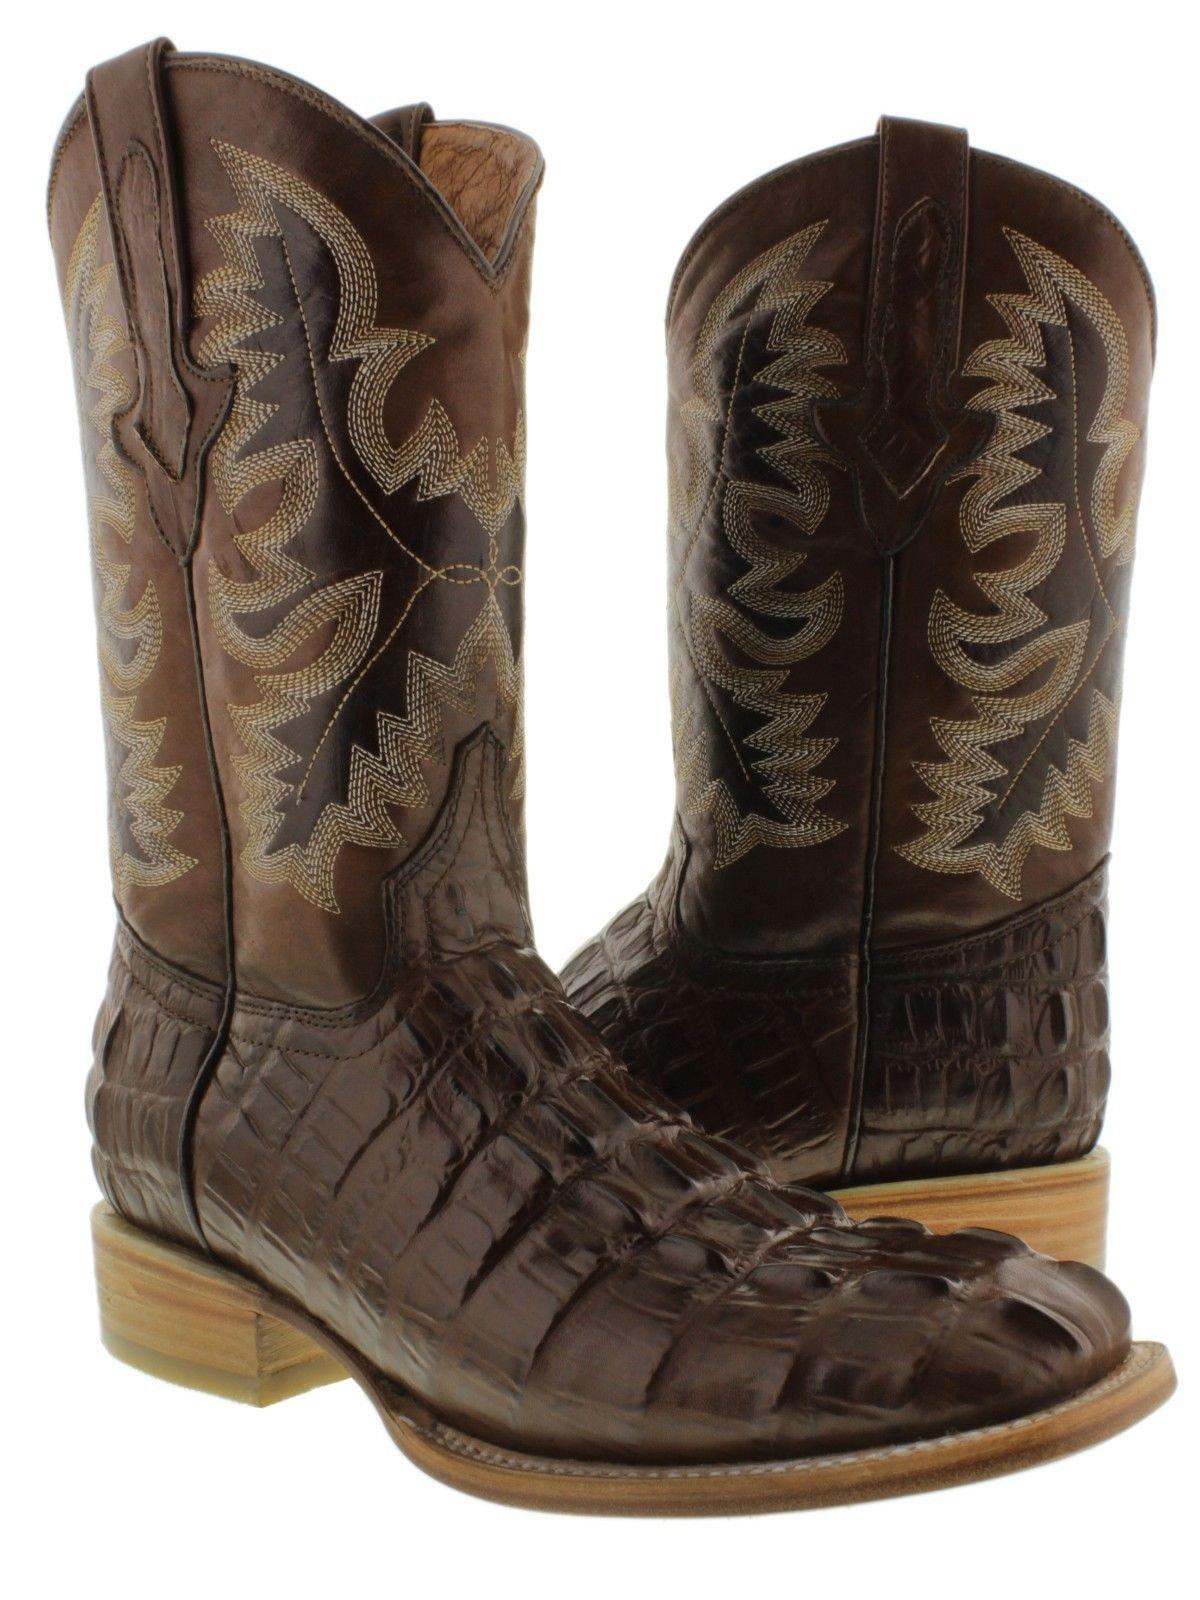 El Presidente Men's Brown Crocodile Tail Cowboy Boots Natural Sole Square Toe 12.5 D